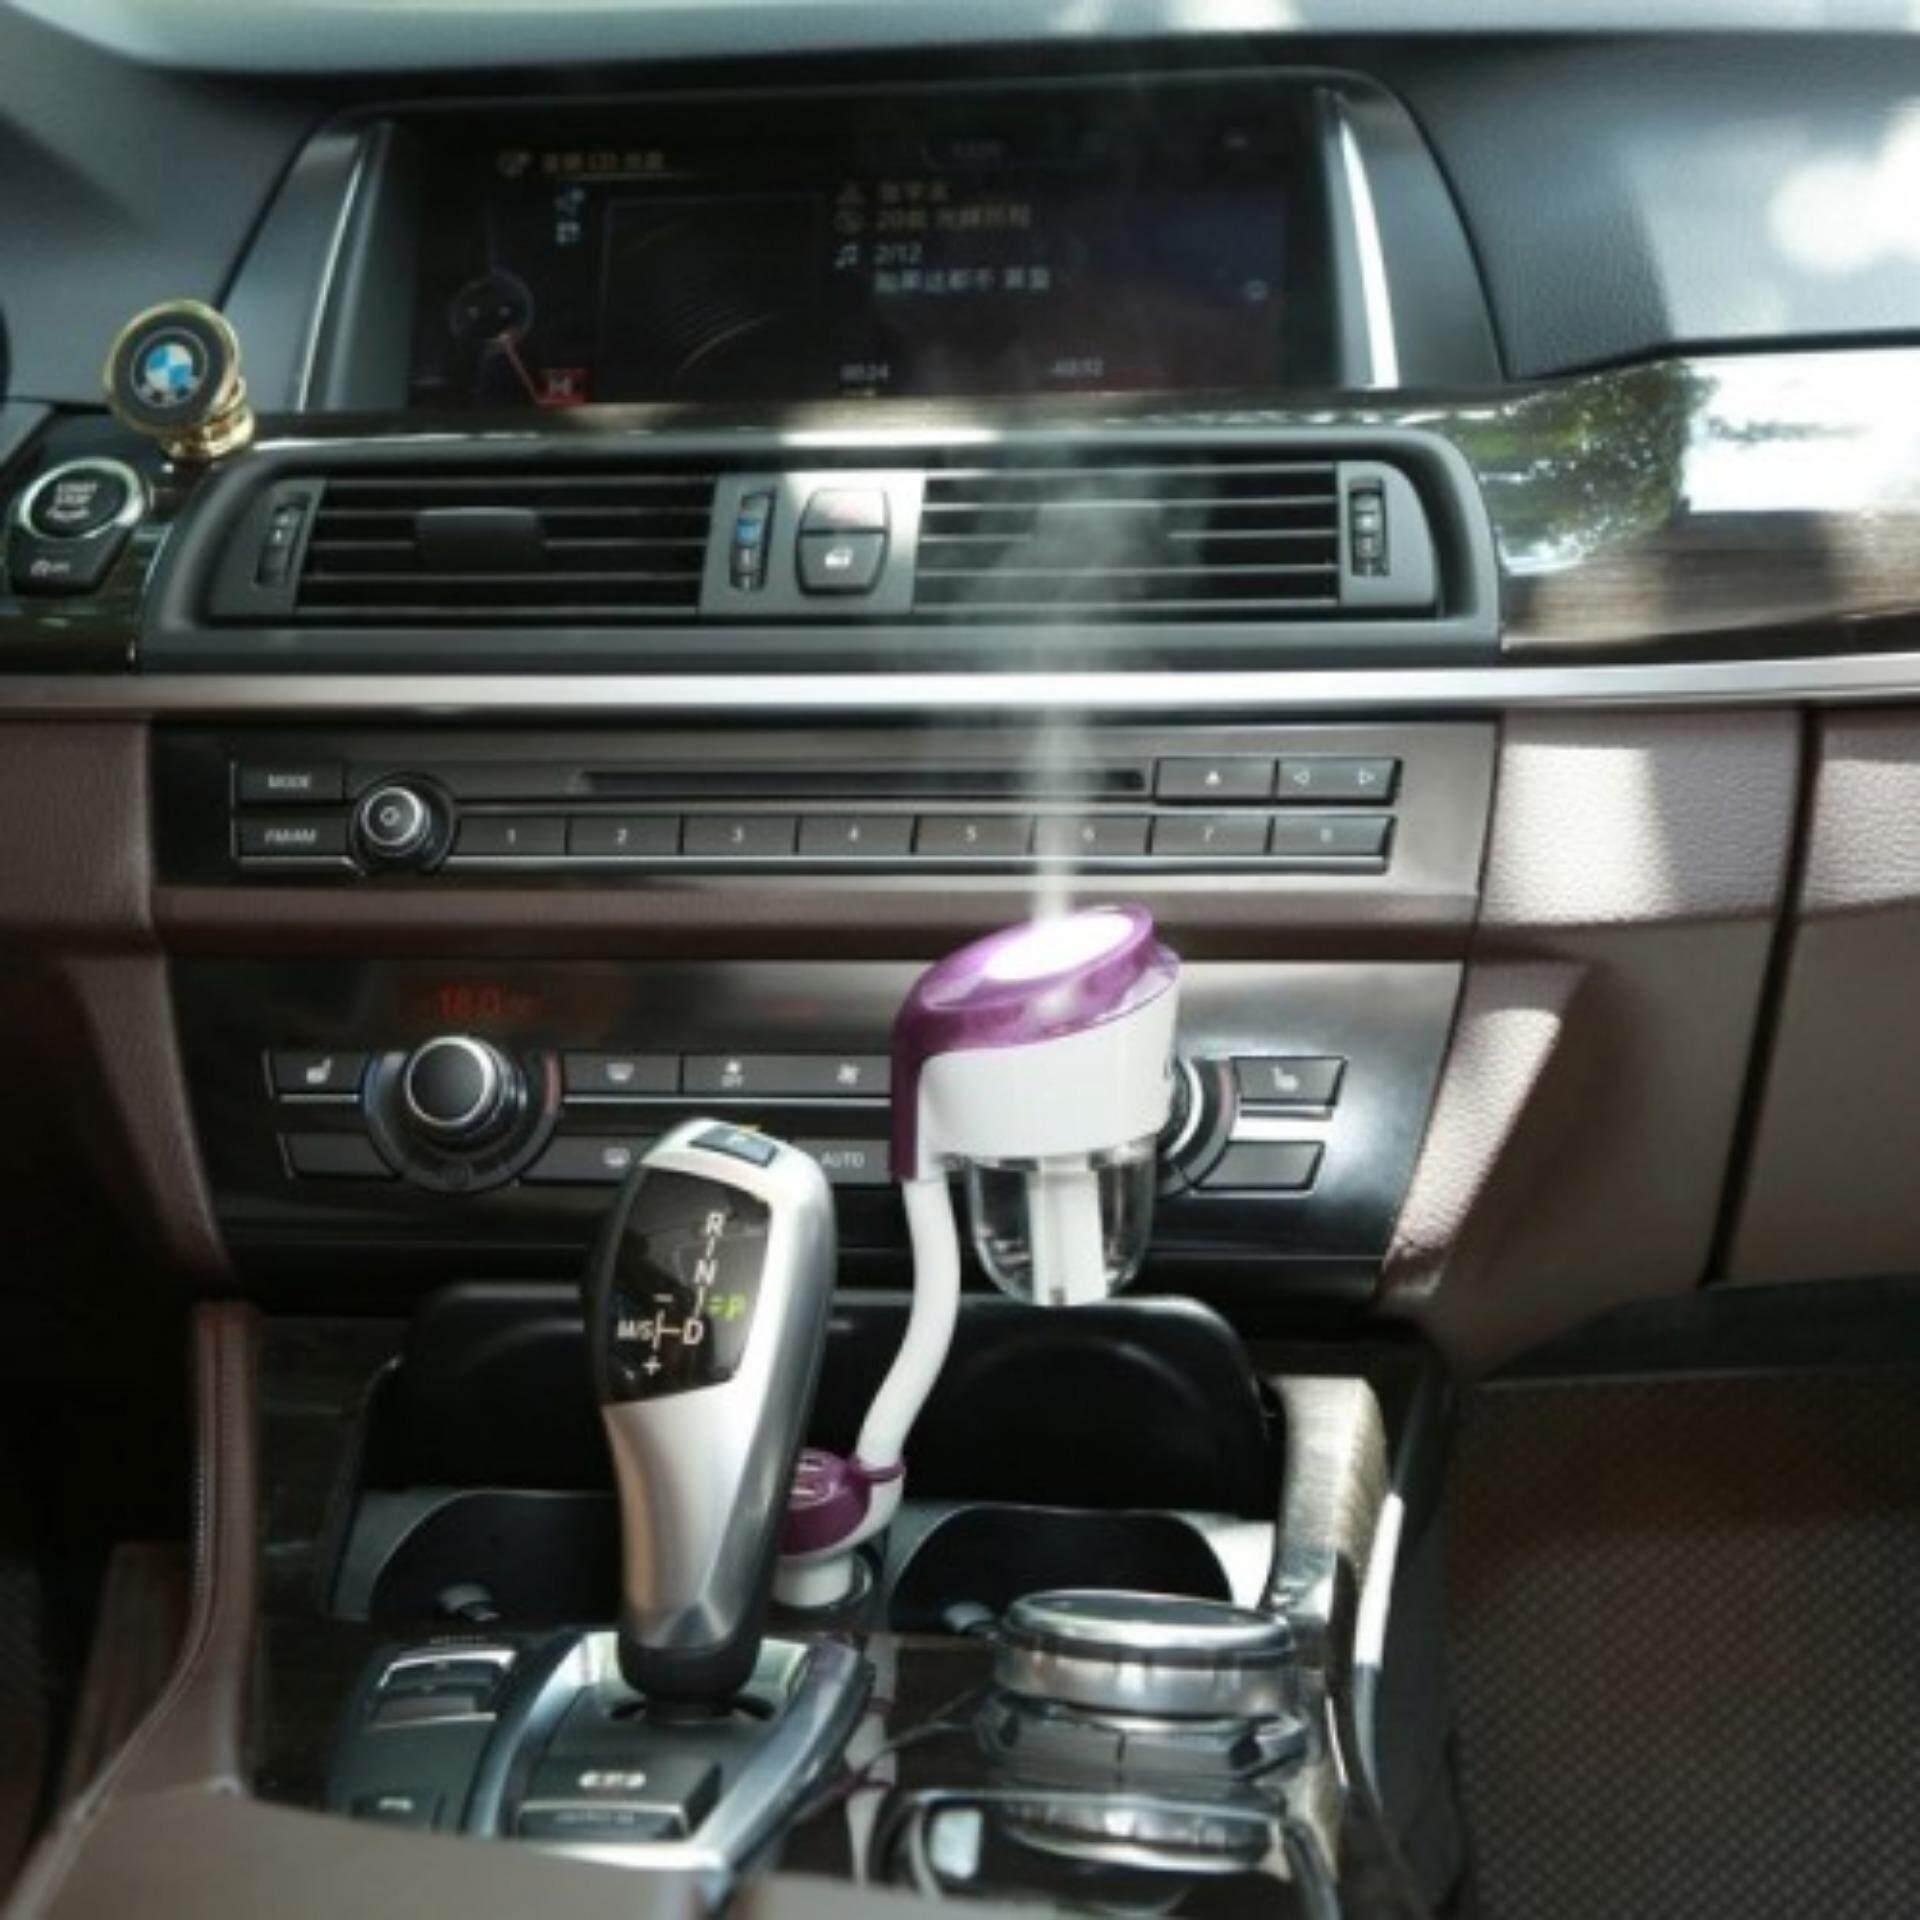 Harga Termurah Nanum Ii Dual Usb Port Car Air Humidifier Purifier Aromateraphy With 2 Charger Purple